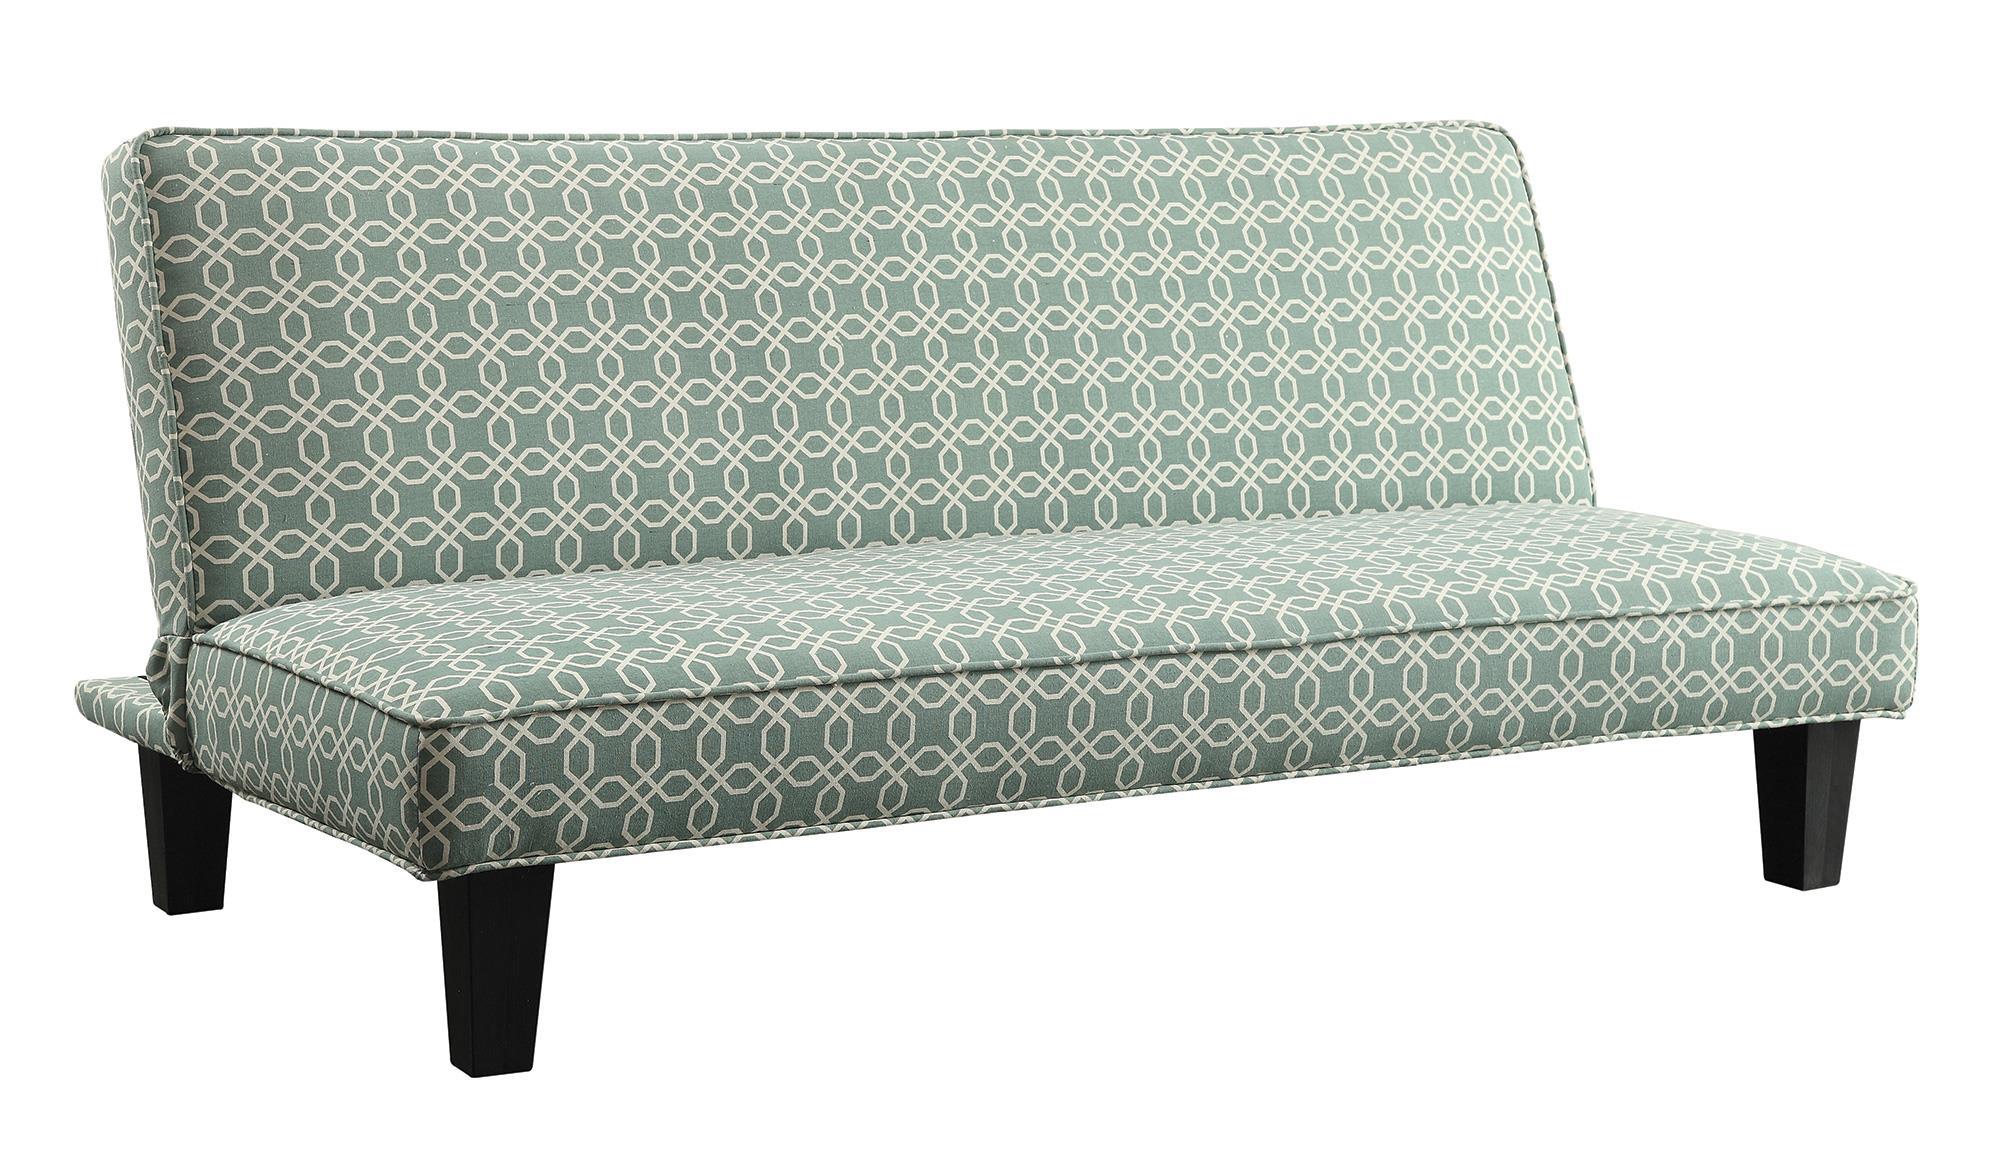 Coaster Futons Sofa Bed - Item Number: 500165